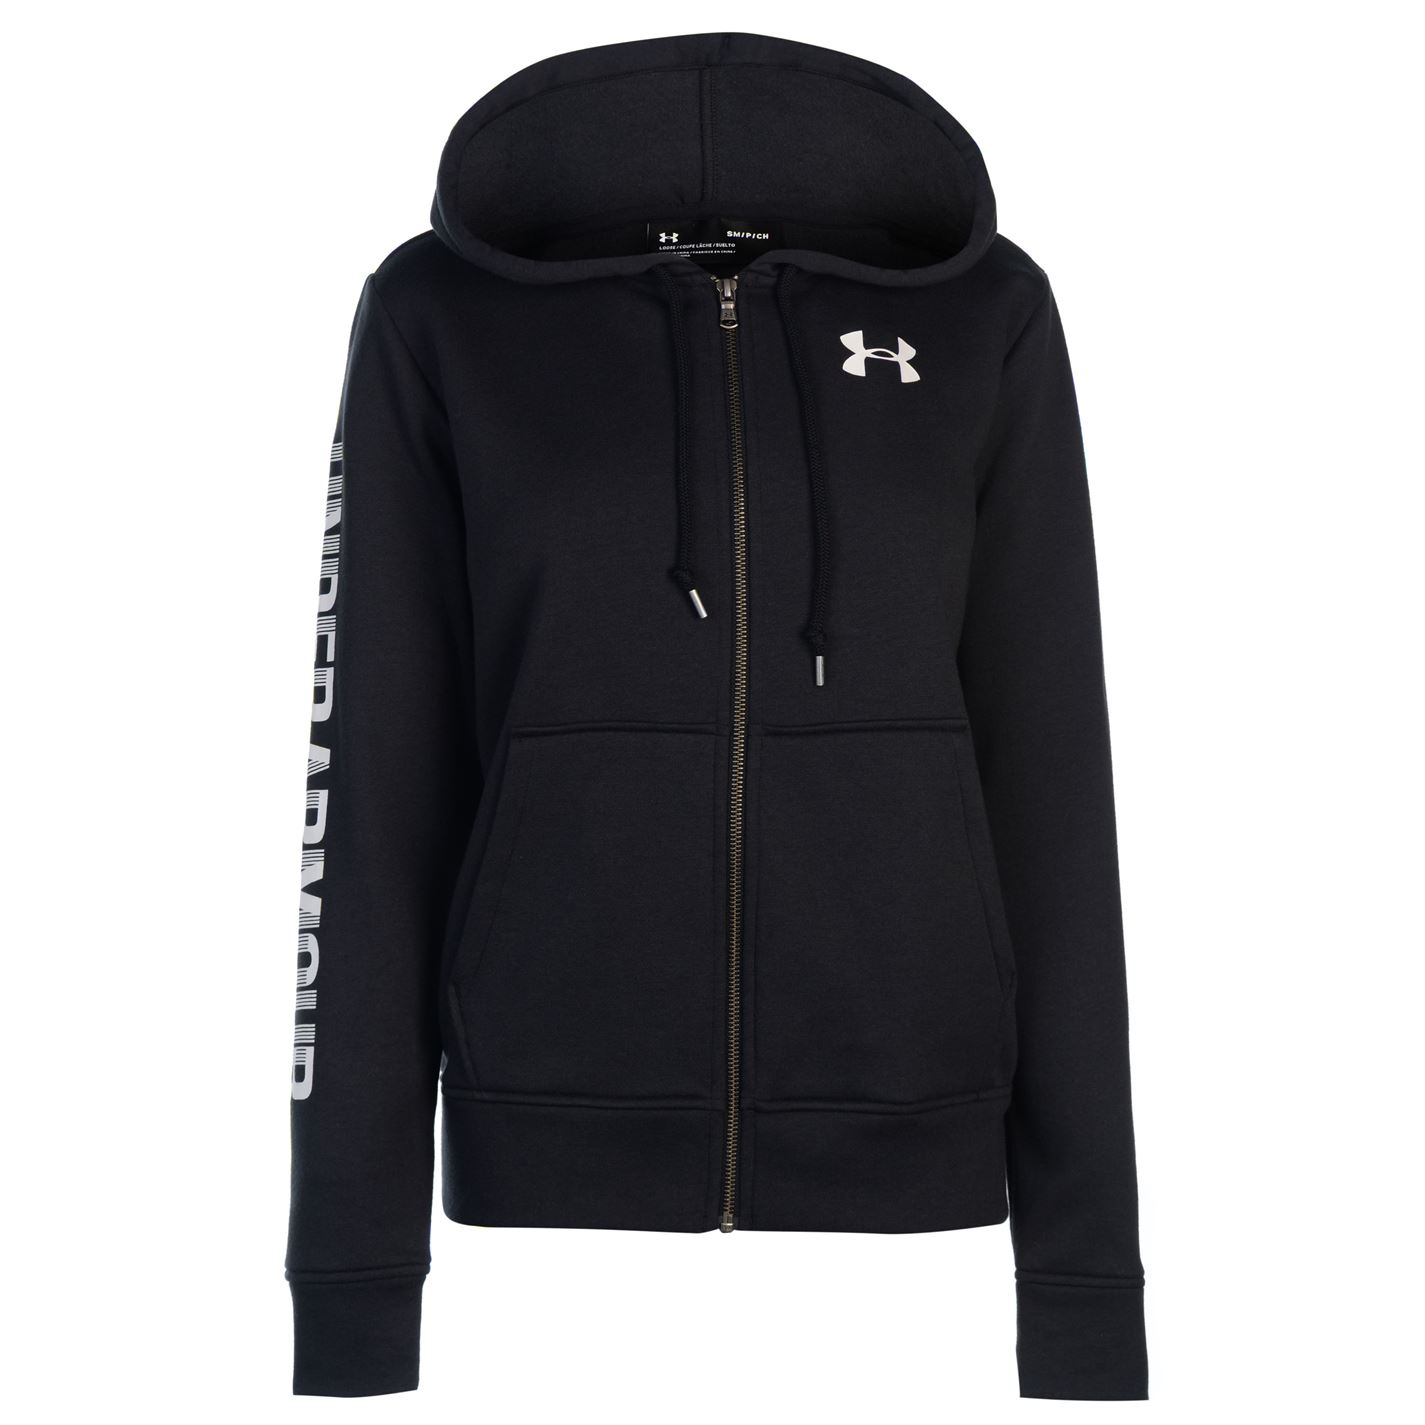 26a389d45c51 Mikina s kapucňou Under Armour Logo Fleece Zip Hoodie Ladies - Glami.sk